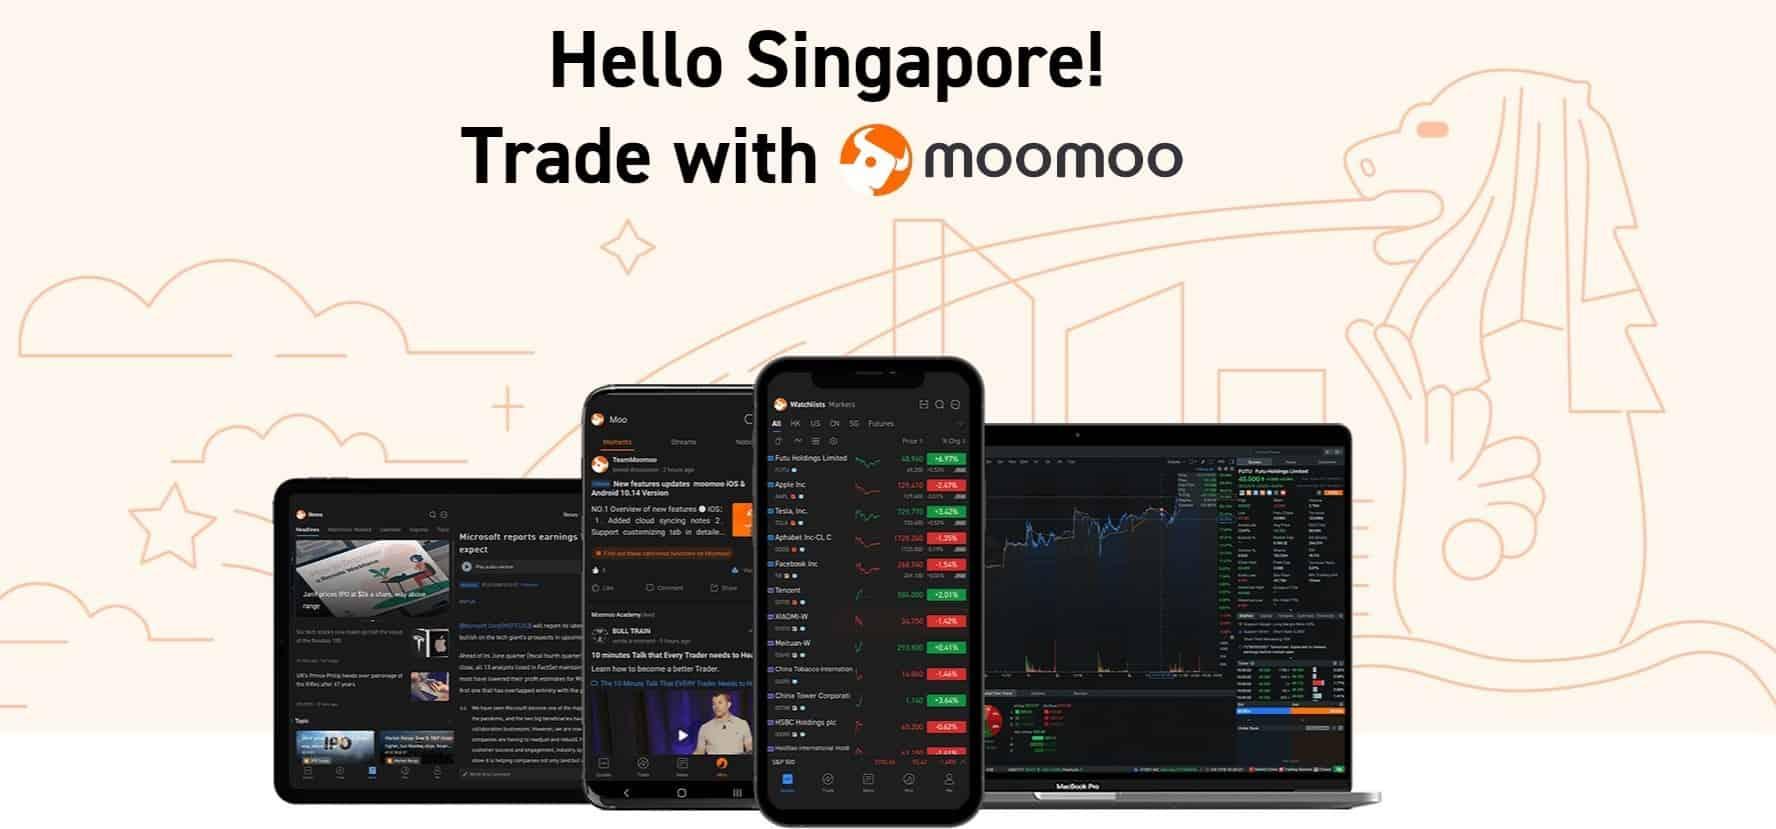 Low-cost online brokerage platform moomoo (by Futu) has finally arrived in Singapore!